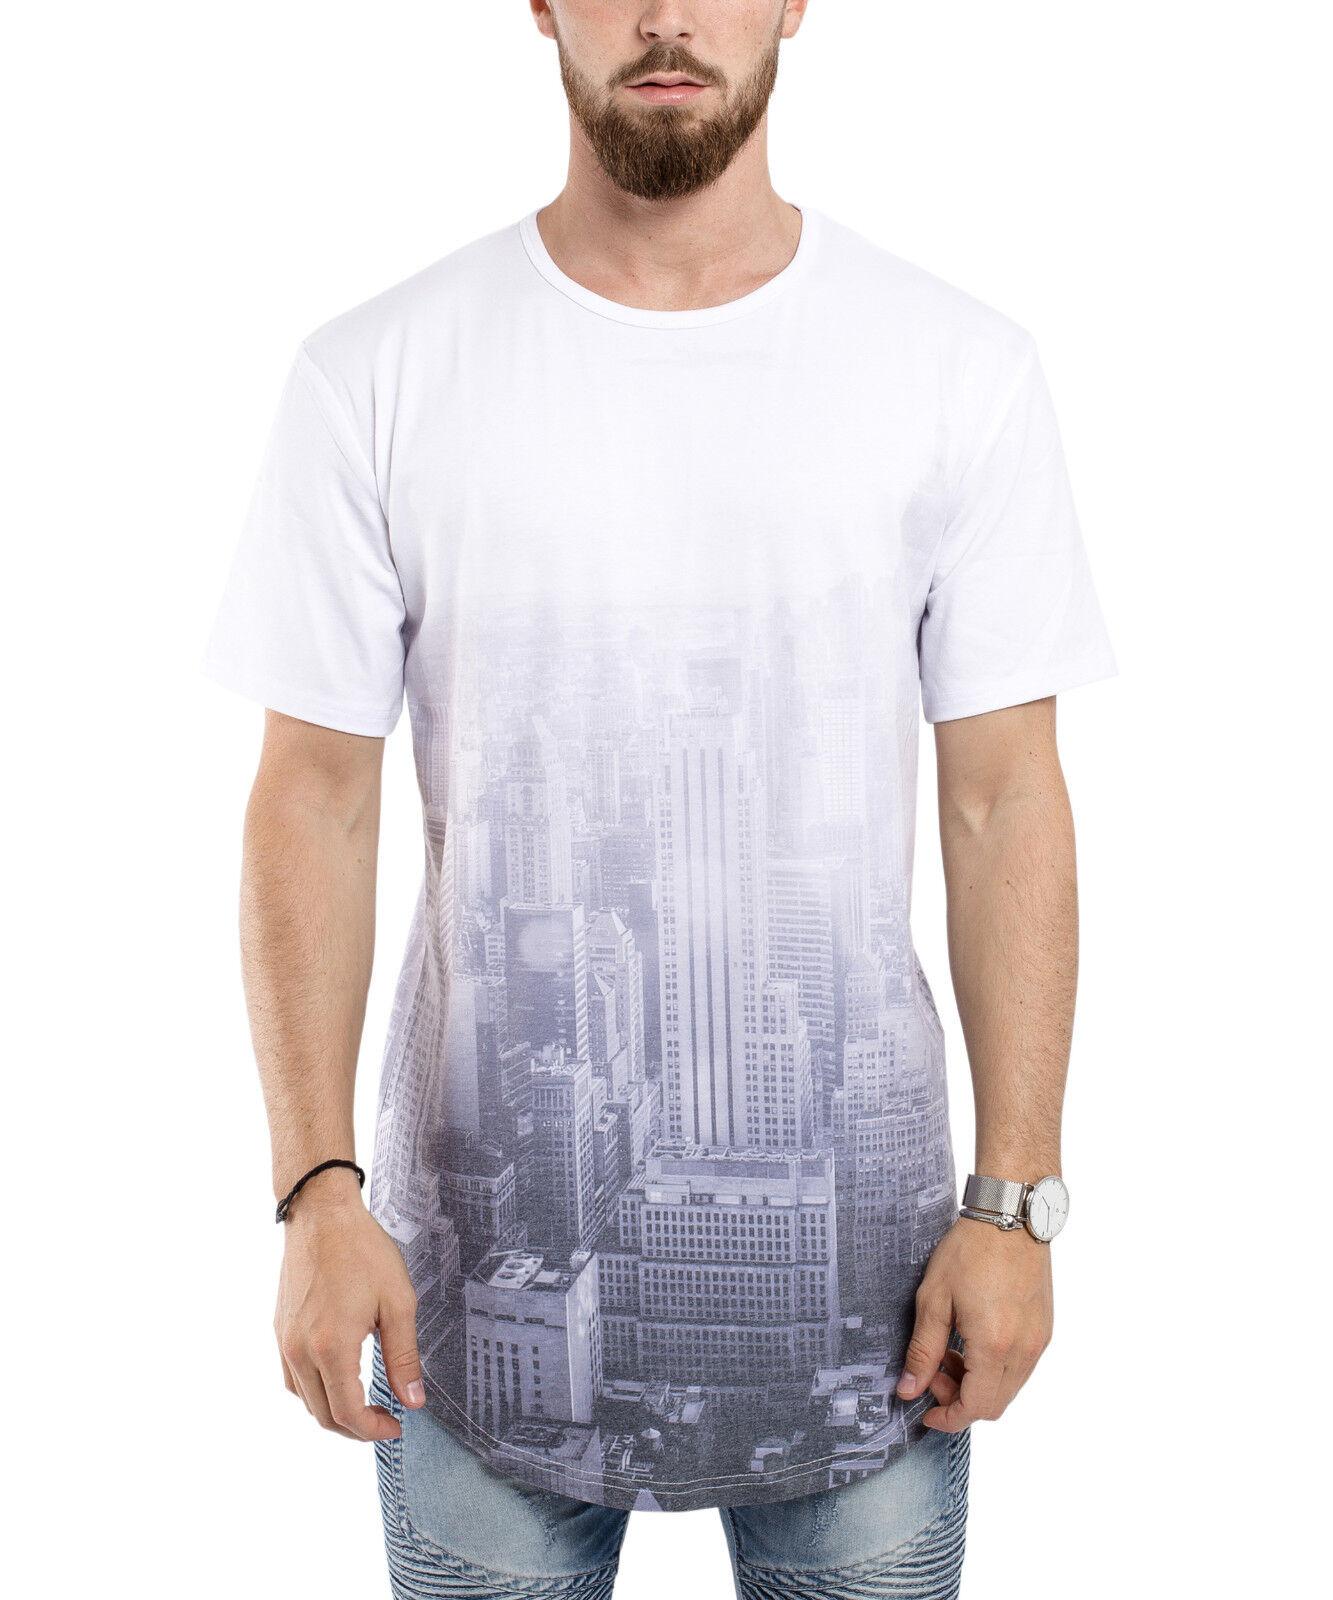 neroskies Città Luminoso OverDimensione T-Shirt Camicia Lunga Uomo Longline New York